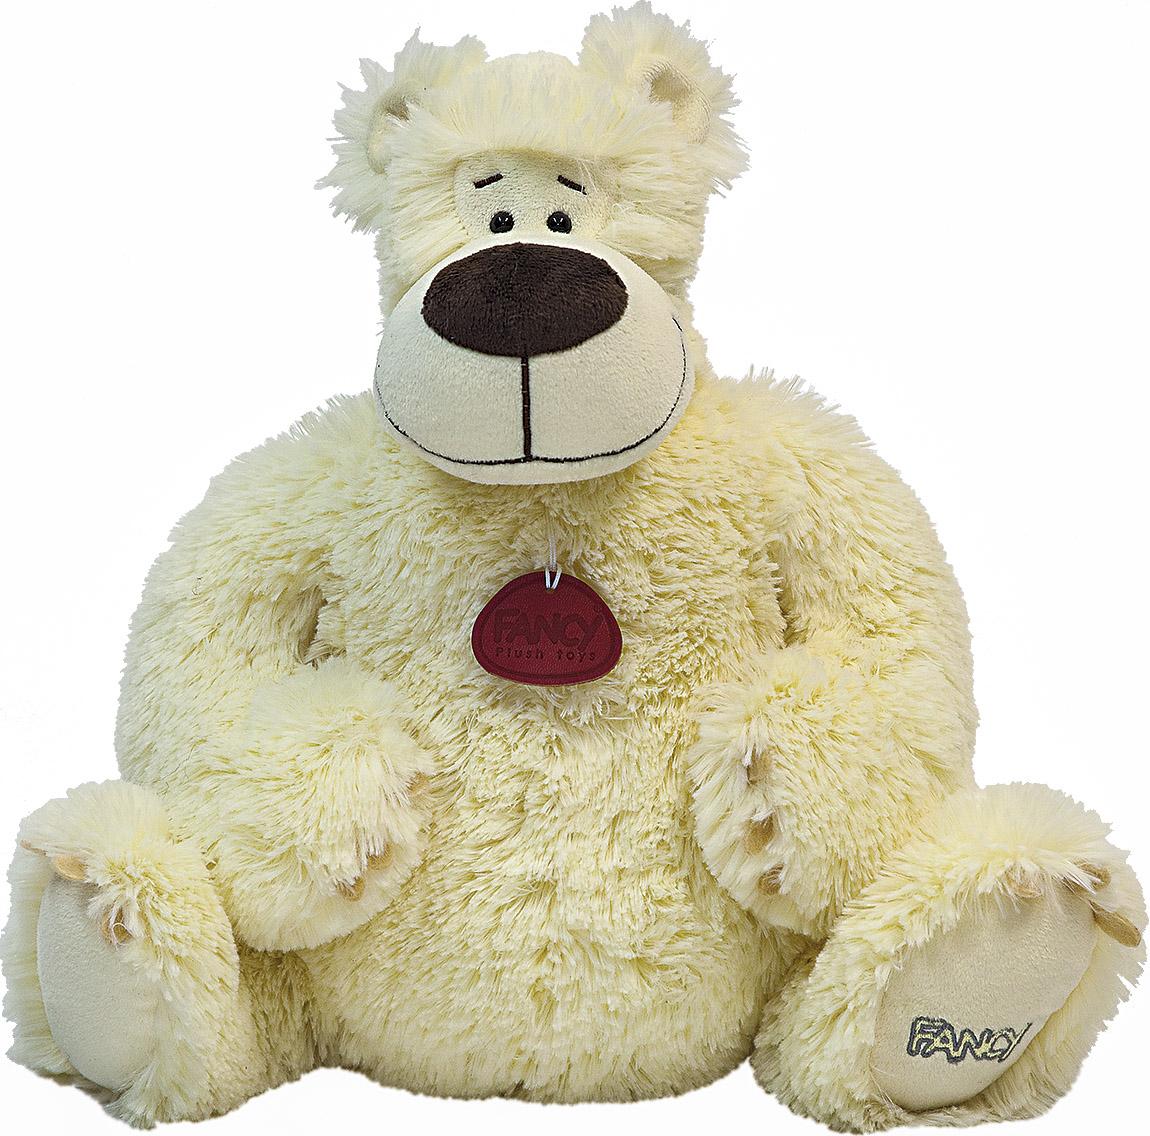 Fancy Мягкая игрушка Медведь Малинкин 42 см fancy мягкая игрушка собака соня 70 см